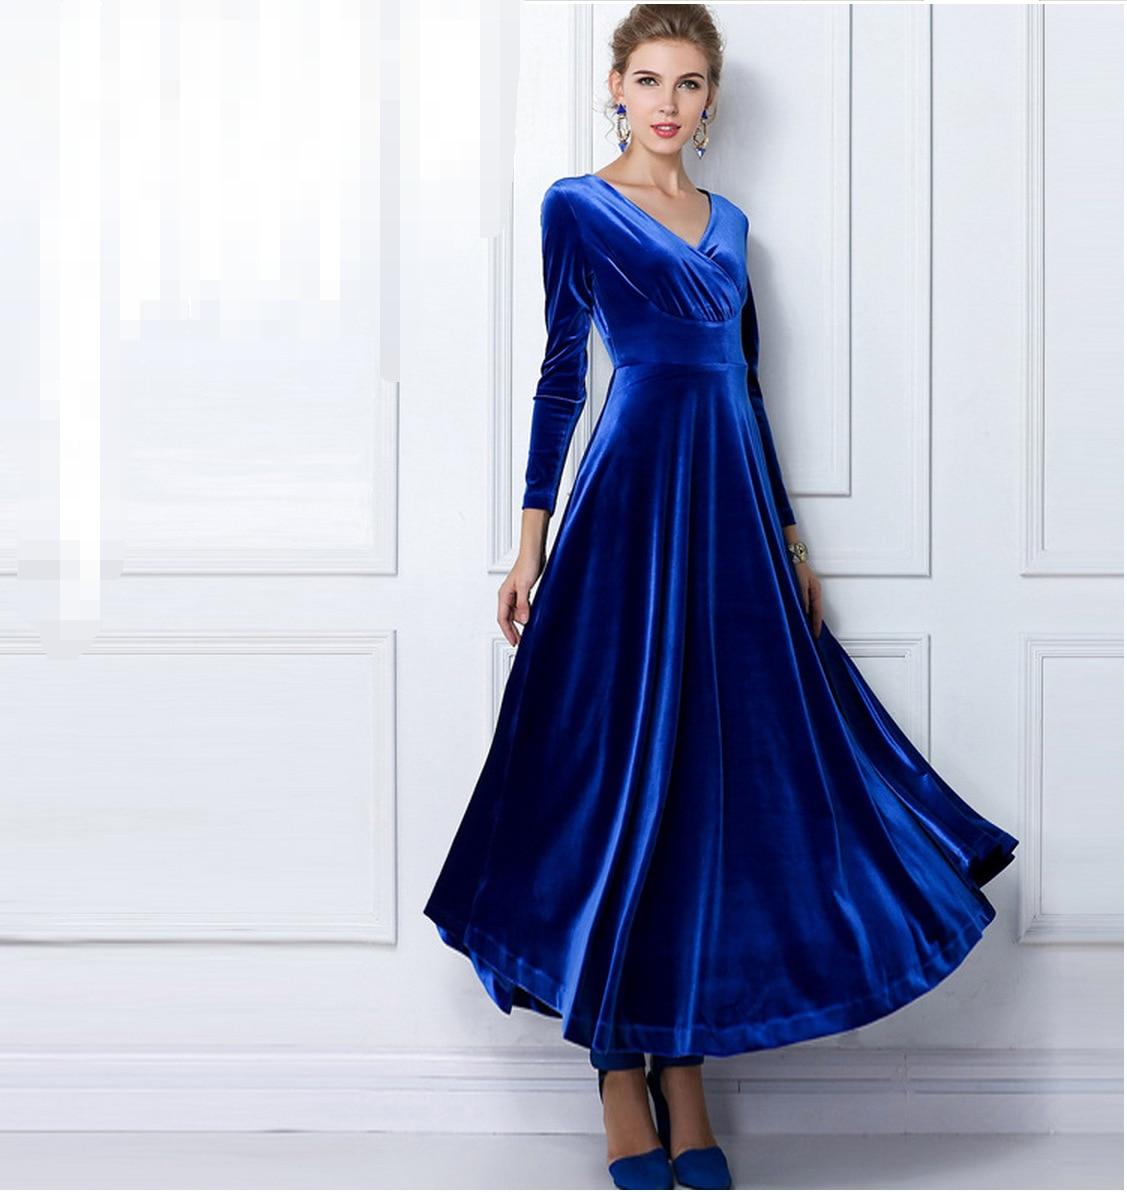 2019 autumn winter dress women elegant casual long sleeve